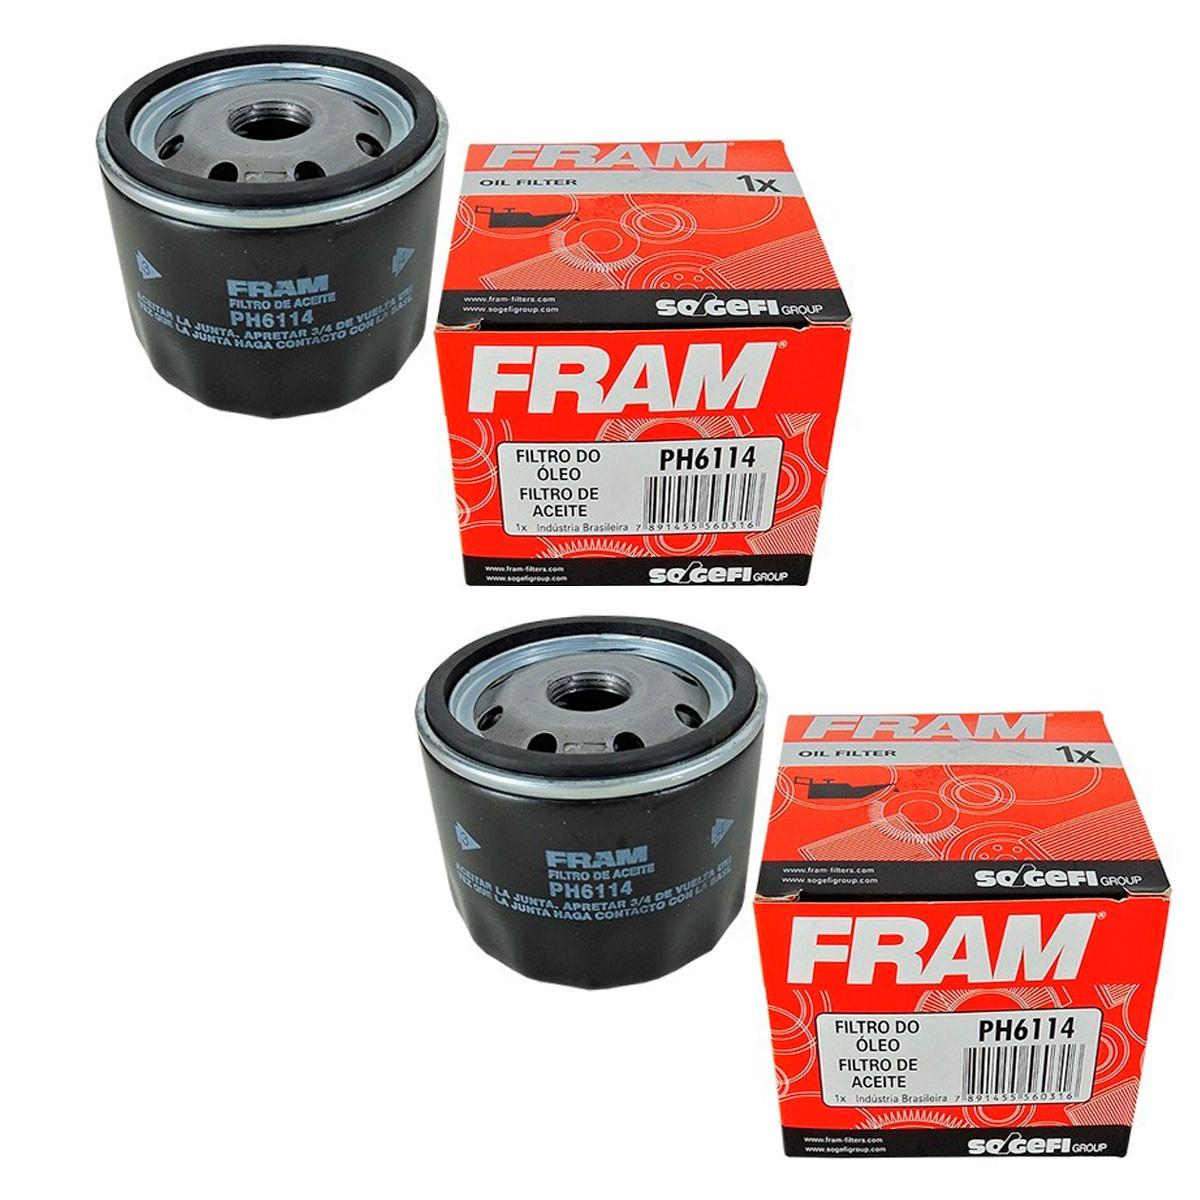 2 Filtros Oleo Fram Ph6114 Moto Bmw F800gs 800r S1000rr K1300